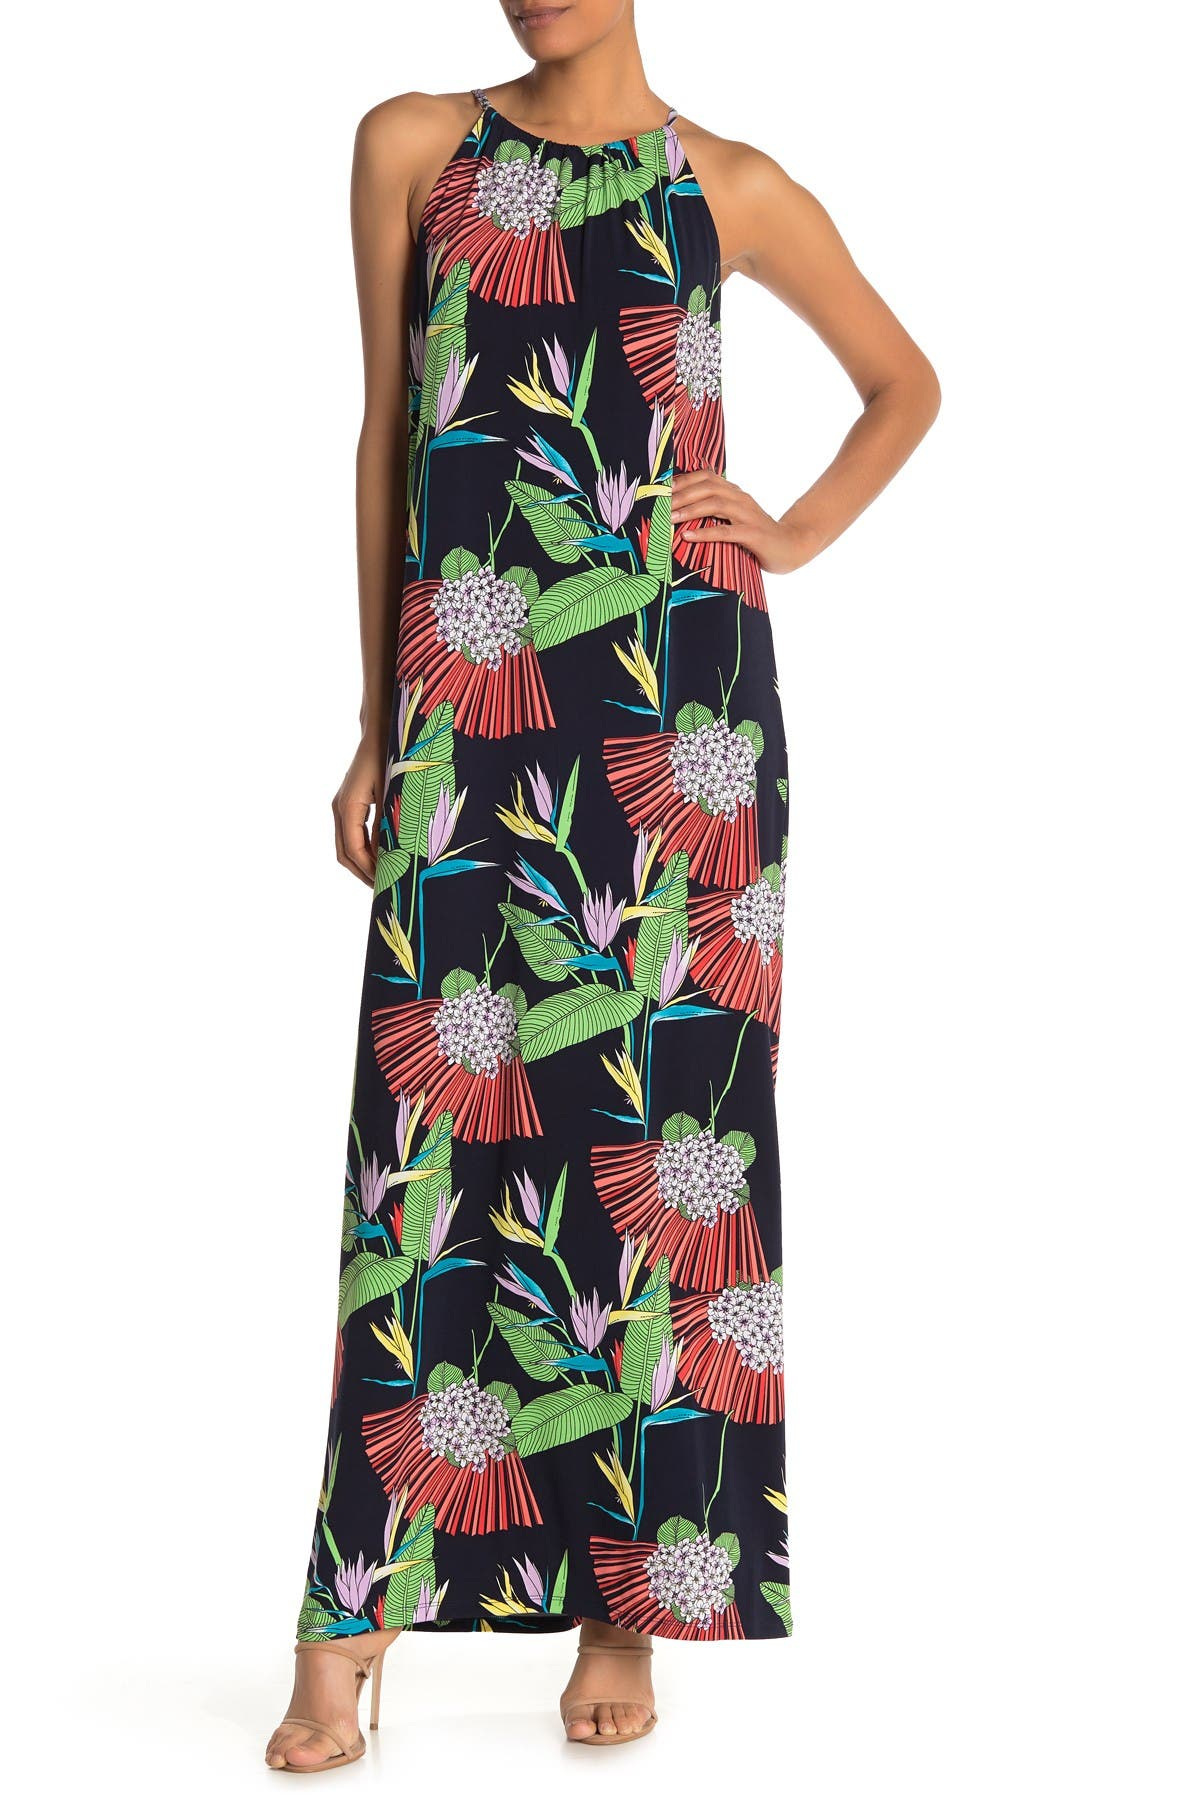 Image of trina Trina Turk Mlian Tropical Halter Neck Maxi Dress